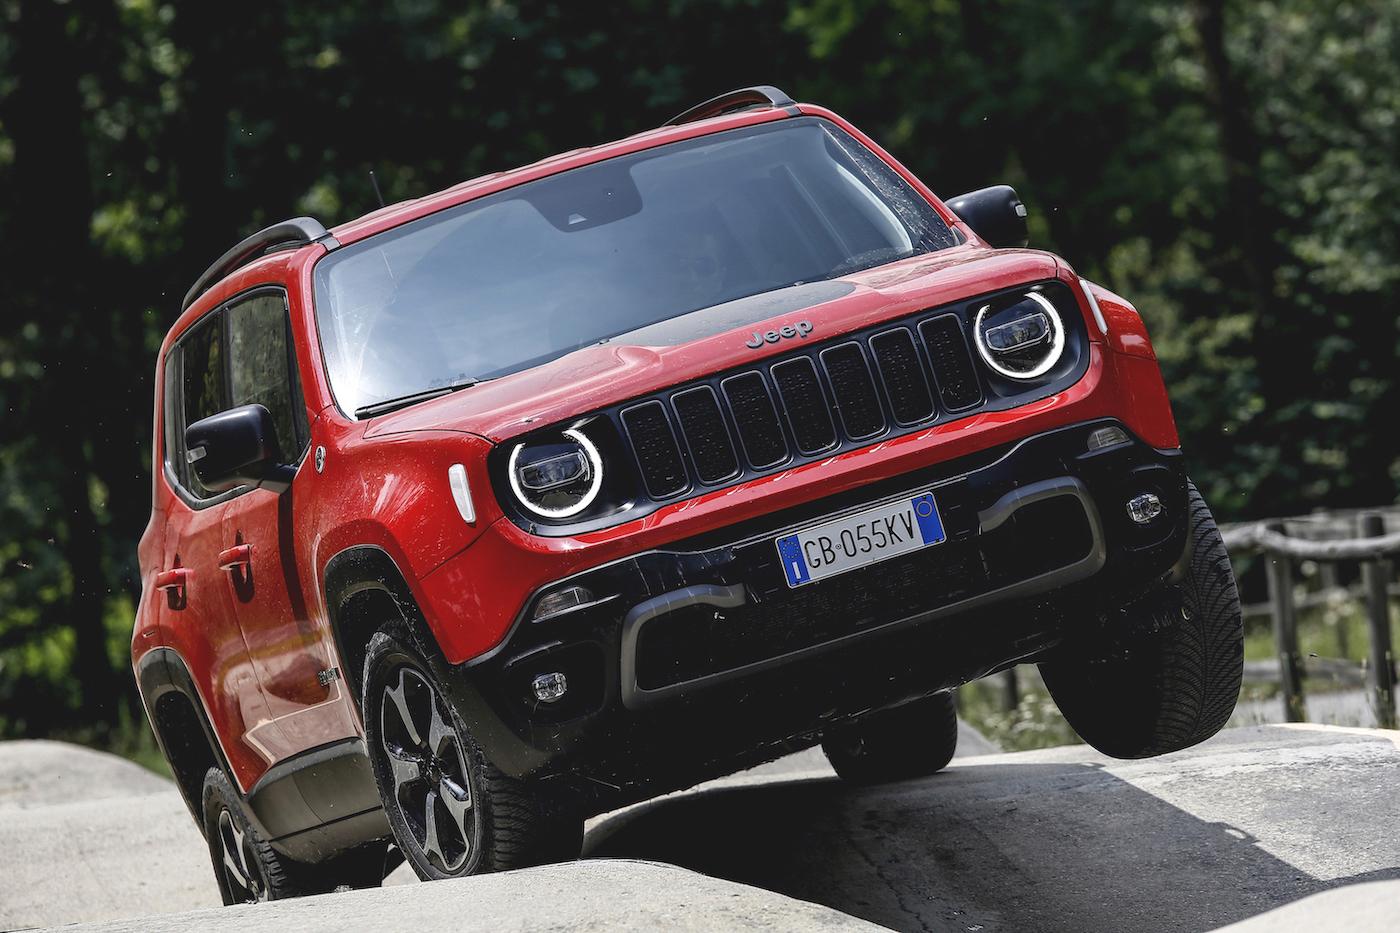 Jeep Renegade Alti Yil Ust Uste En Iyi Kompakt Suv Secildi Autoworlddergisi